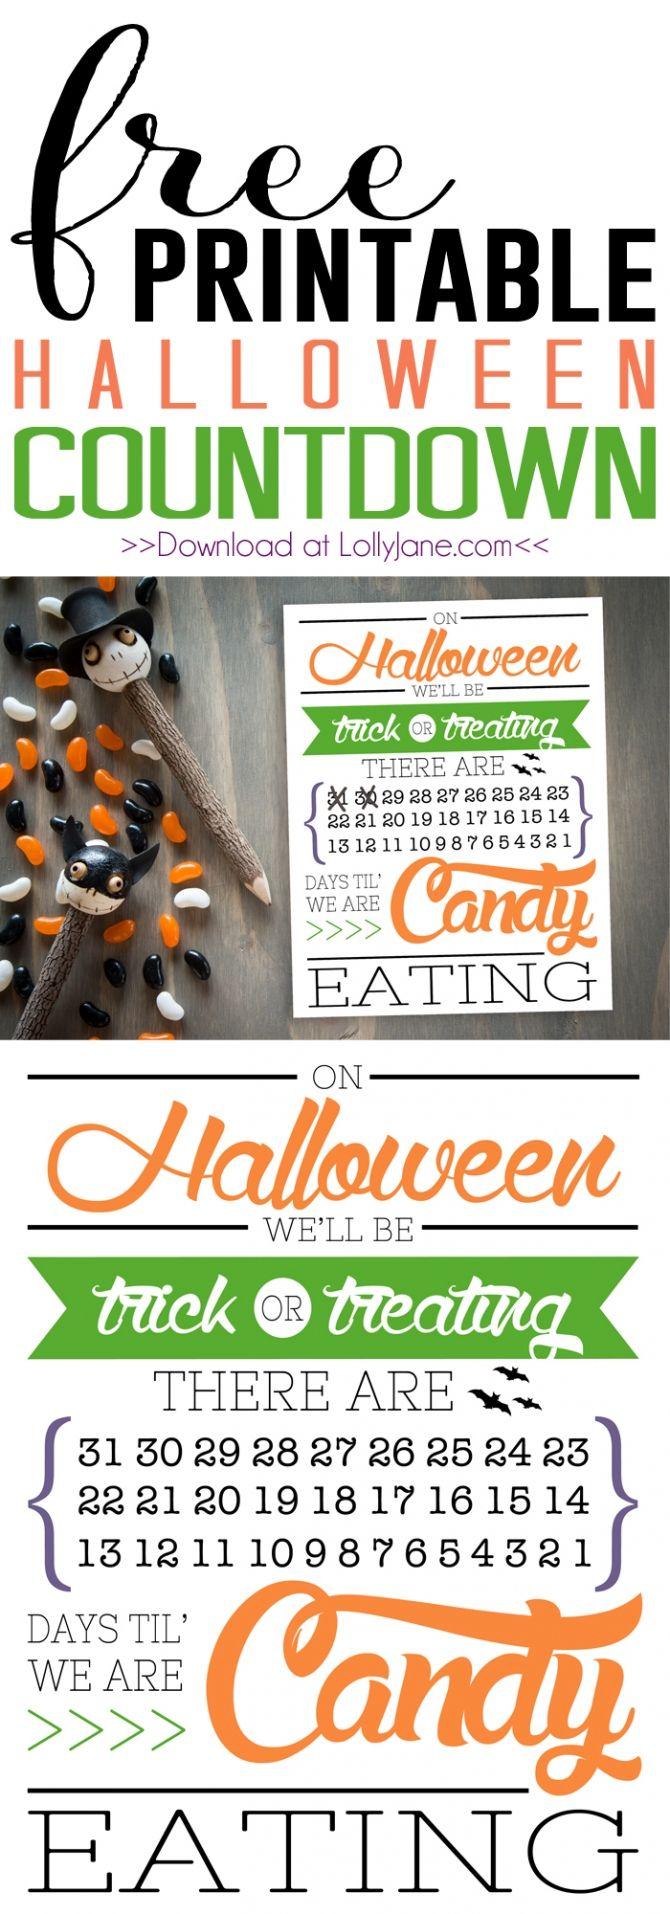 FREE Printable Halloween Countdown! ...includes DIY Board Tutorial, too!